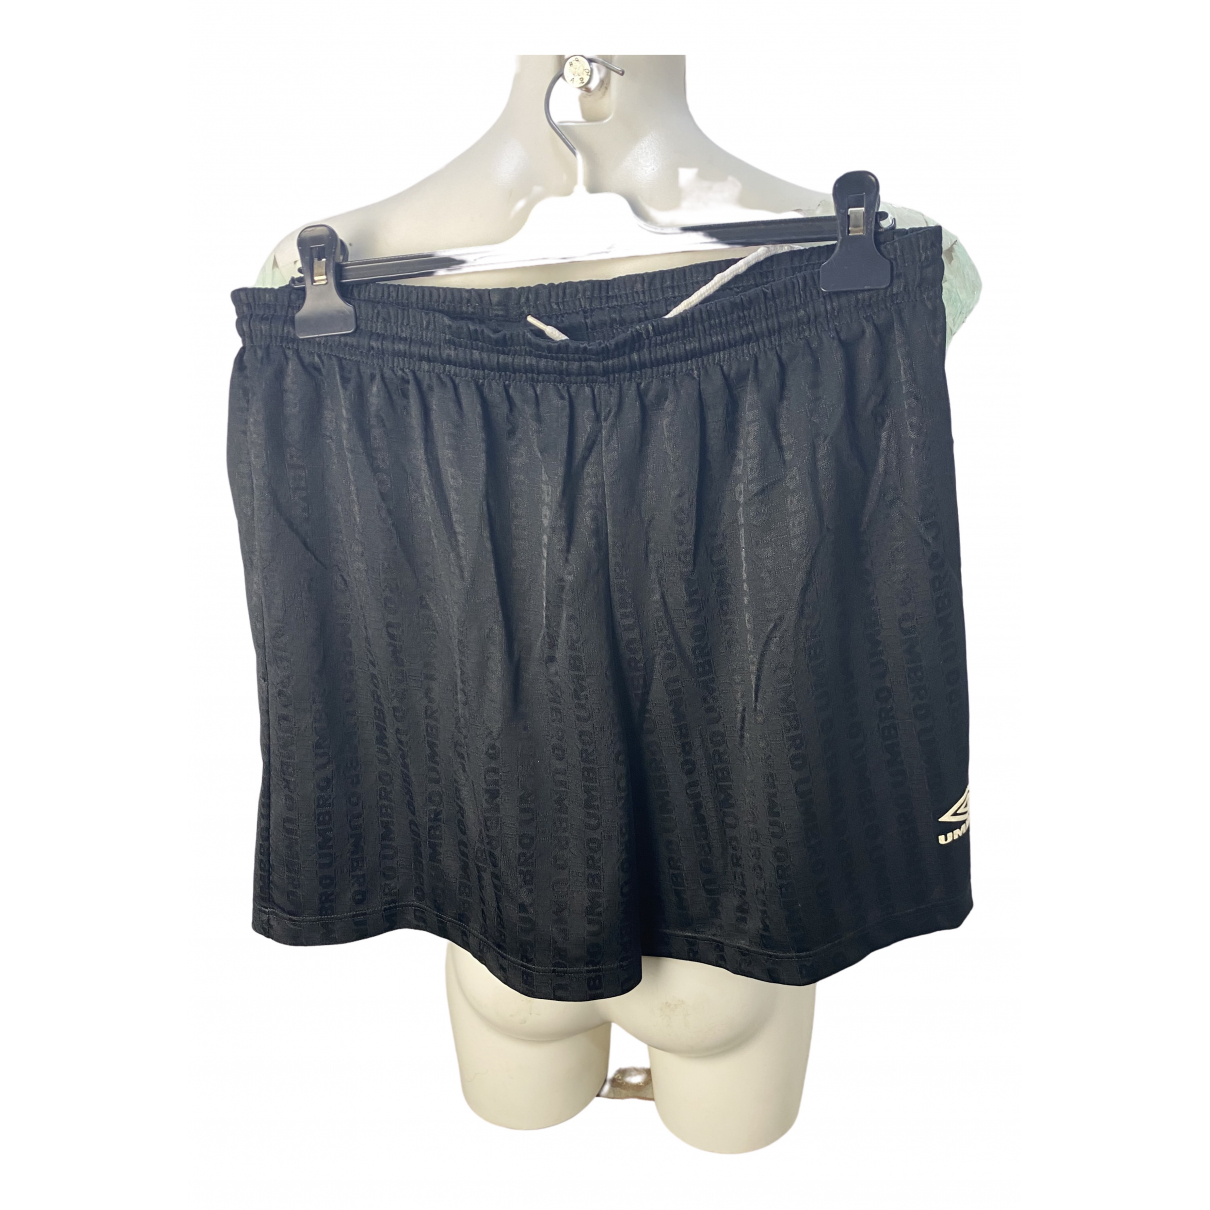 Umbro \N Shorts in  Schwarz Polyester